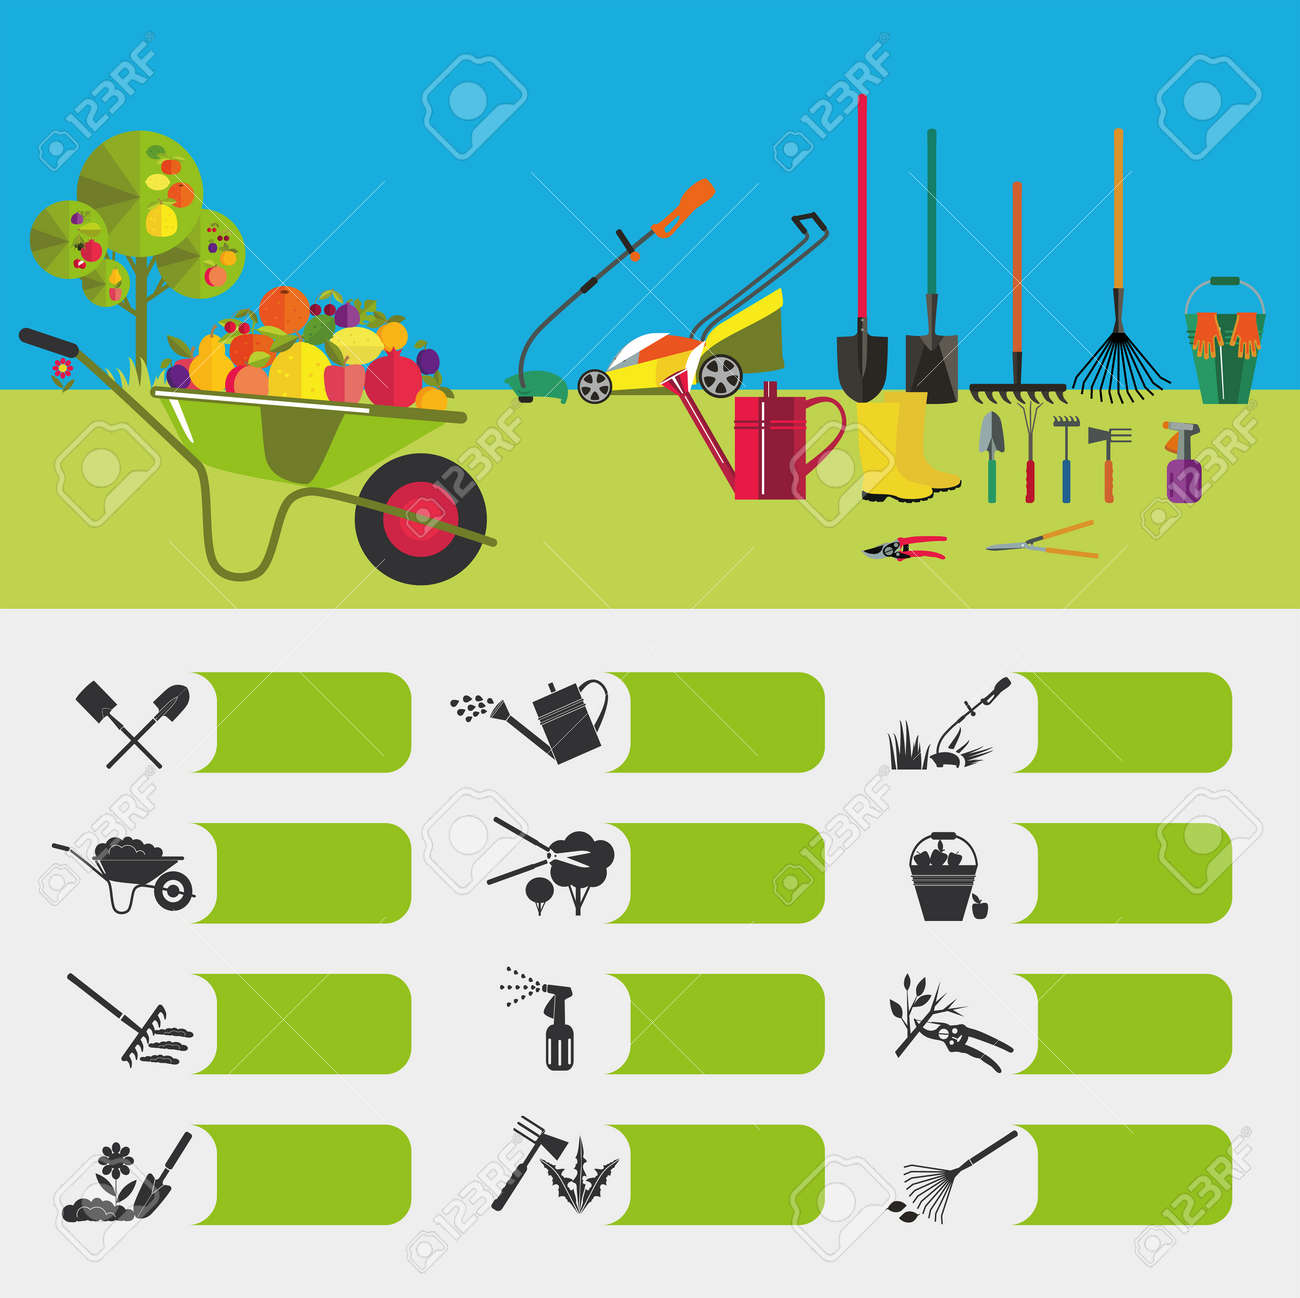 Gardening icons on the theme of organic farming symbols stages gardening icons on the theme of organic farming symbols stages of cultivation of plants biocorpaavc